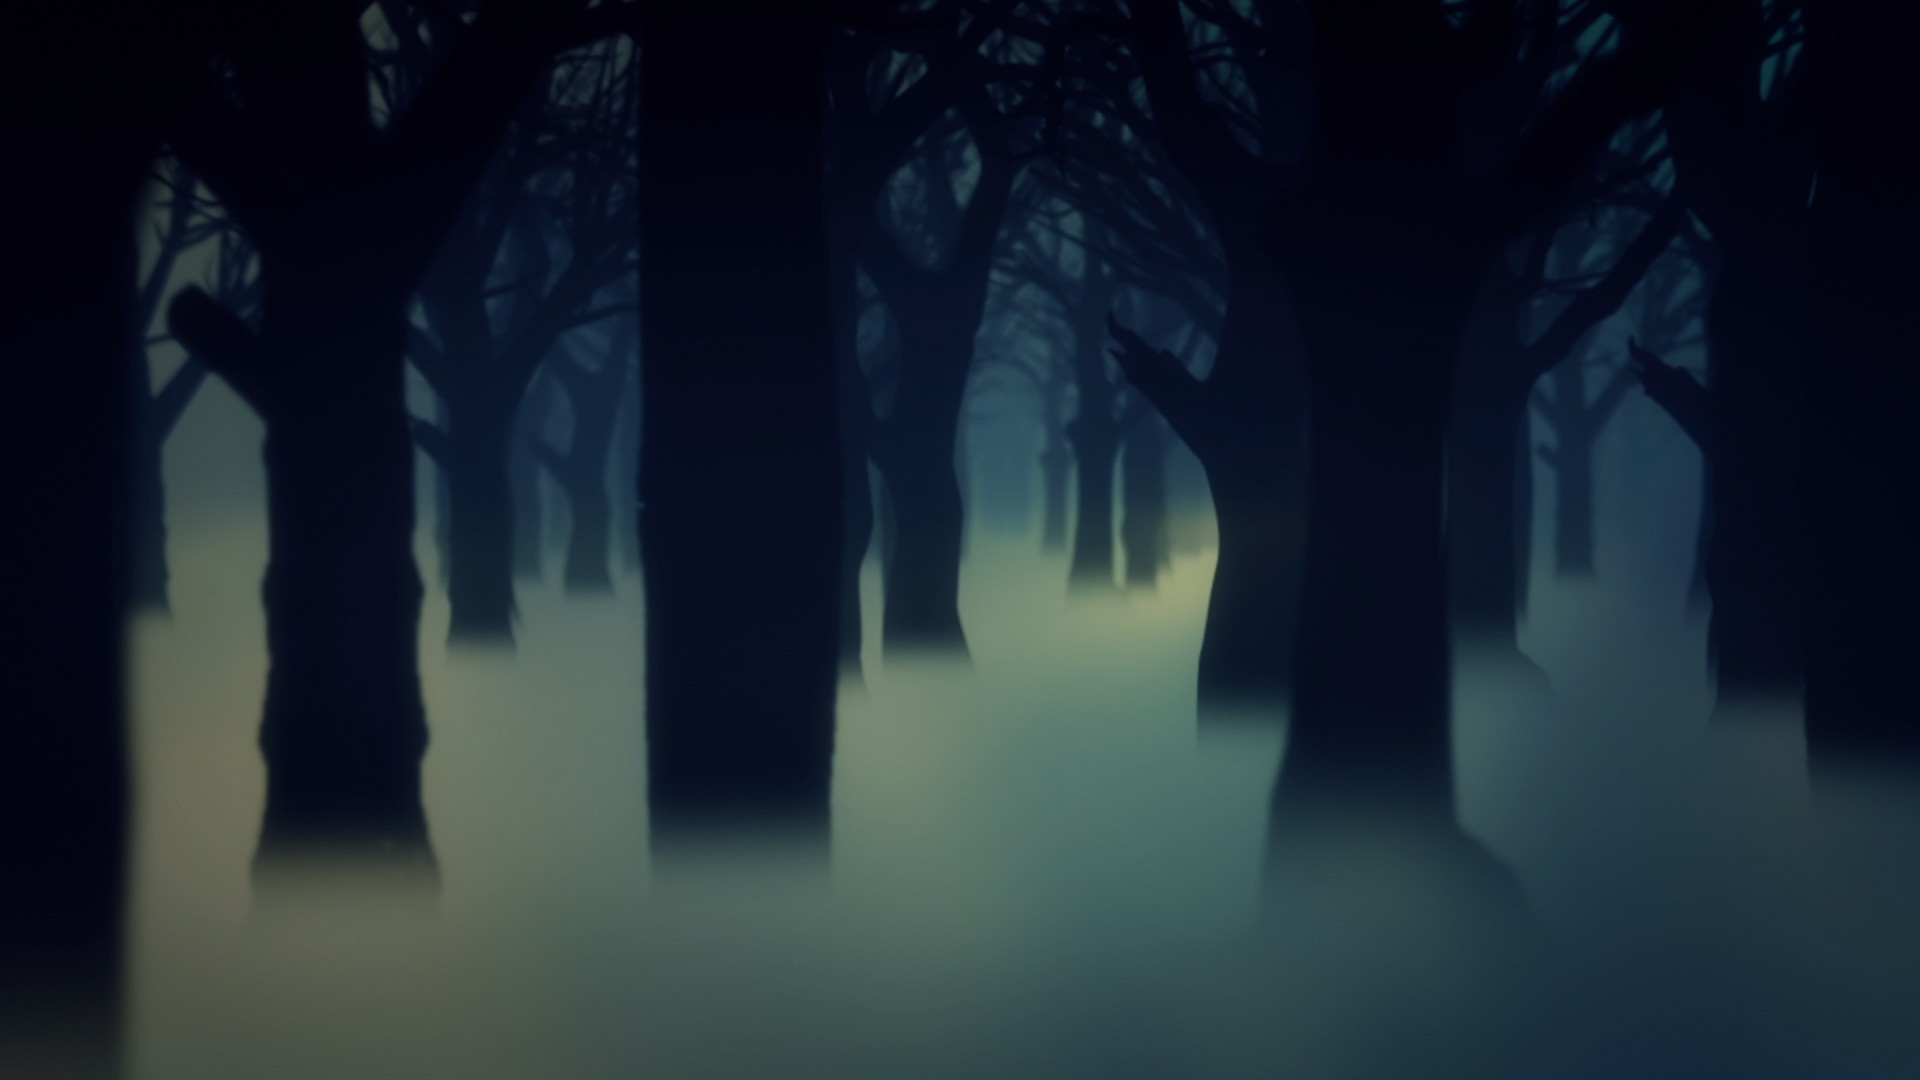 Dark Forest Fog Trees Animated Background Wallpaper PixelBoom